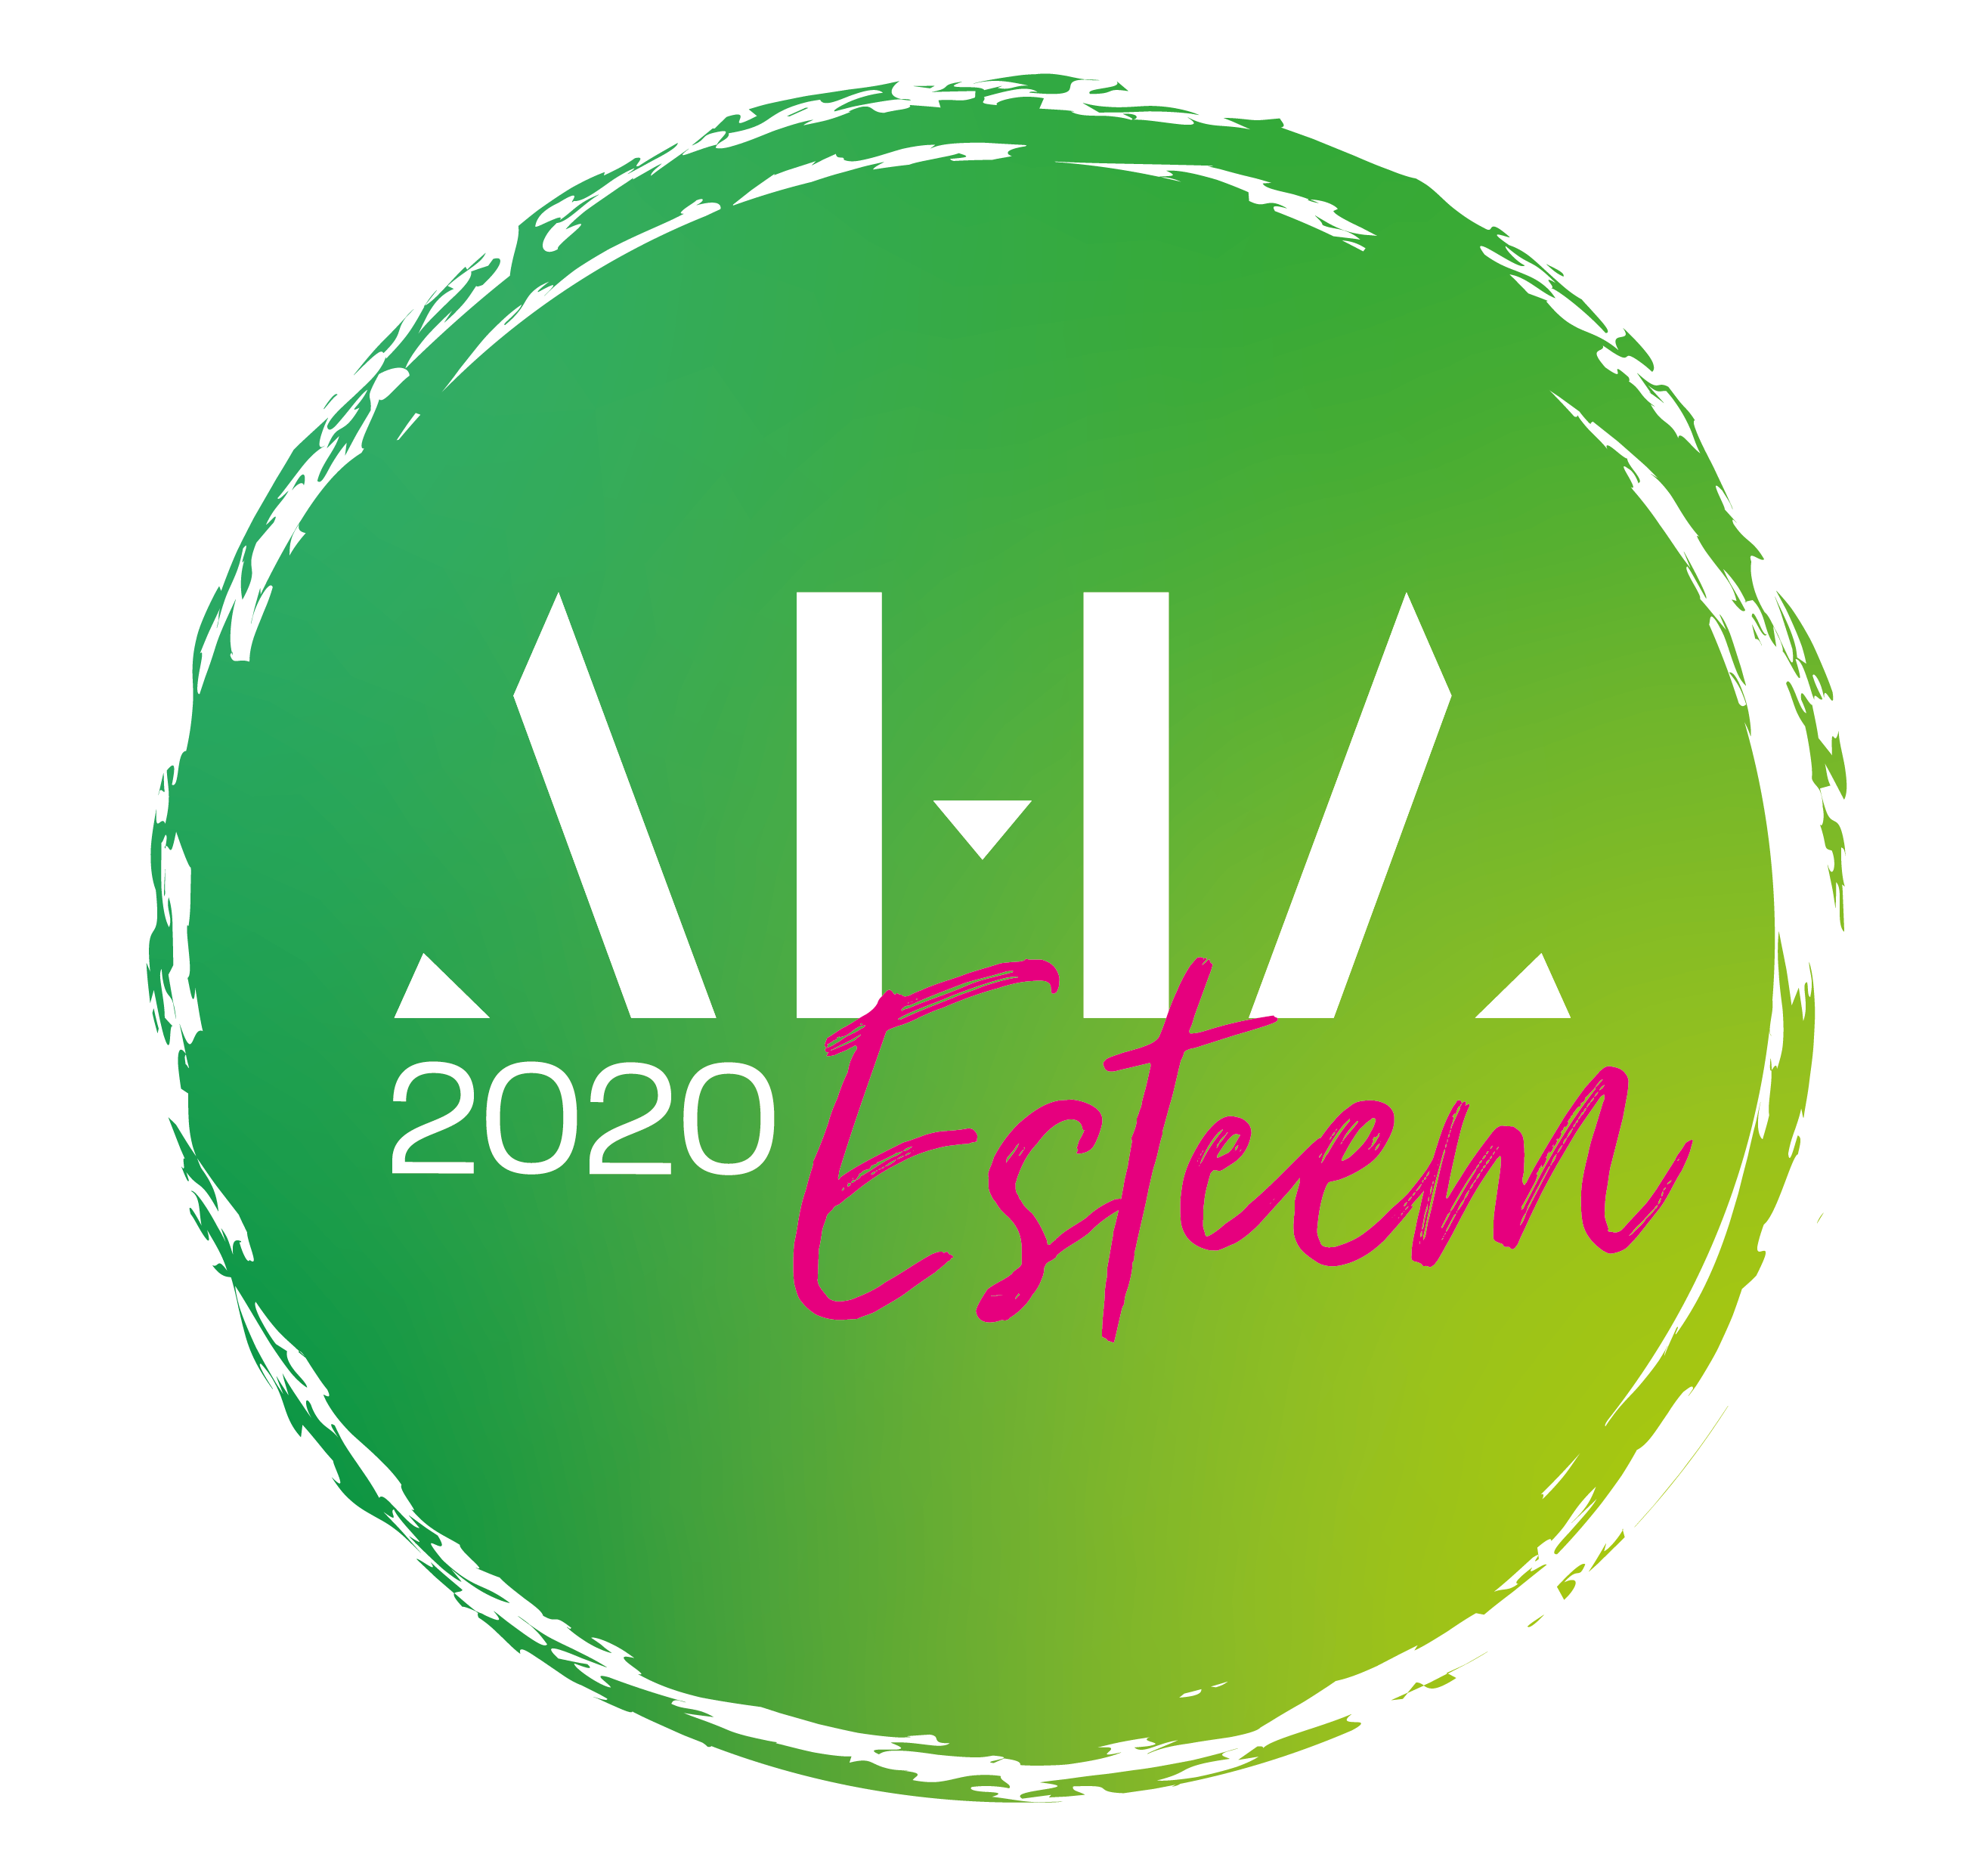 AHA esteem logo 2020-01